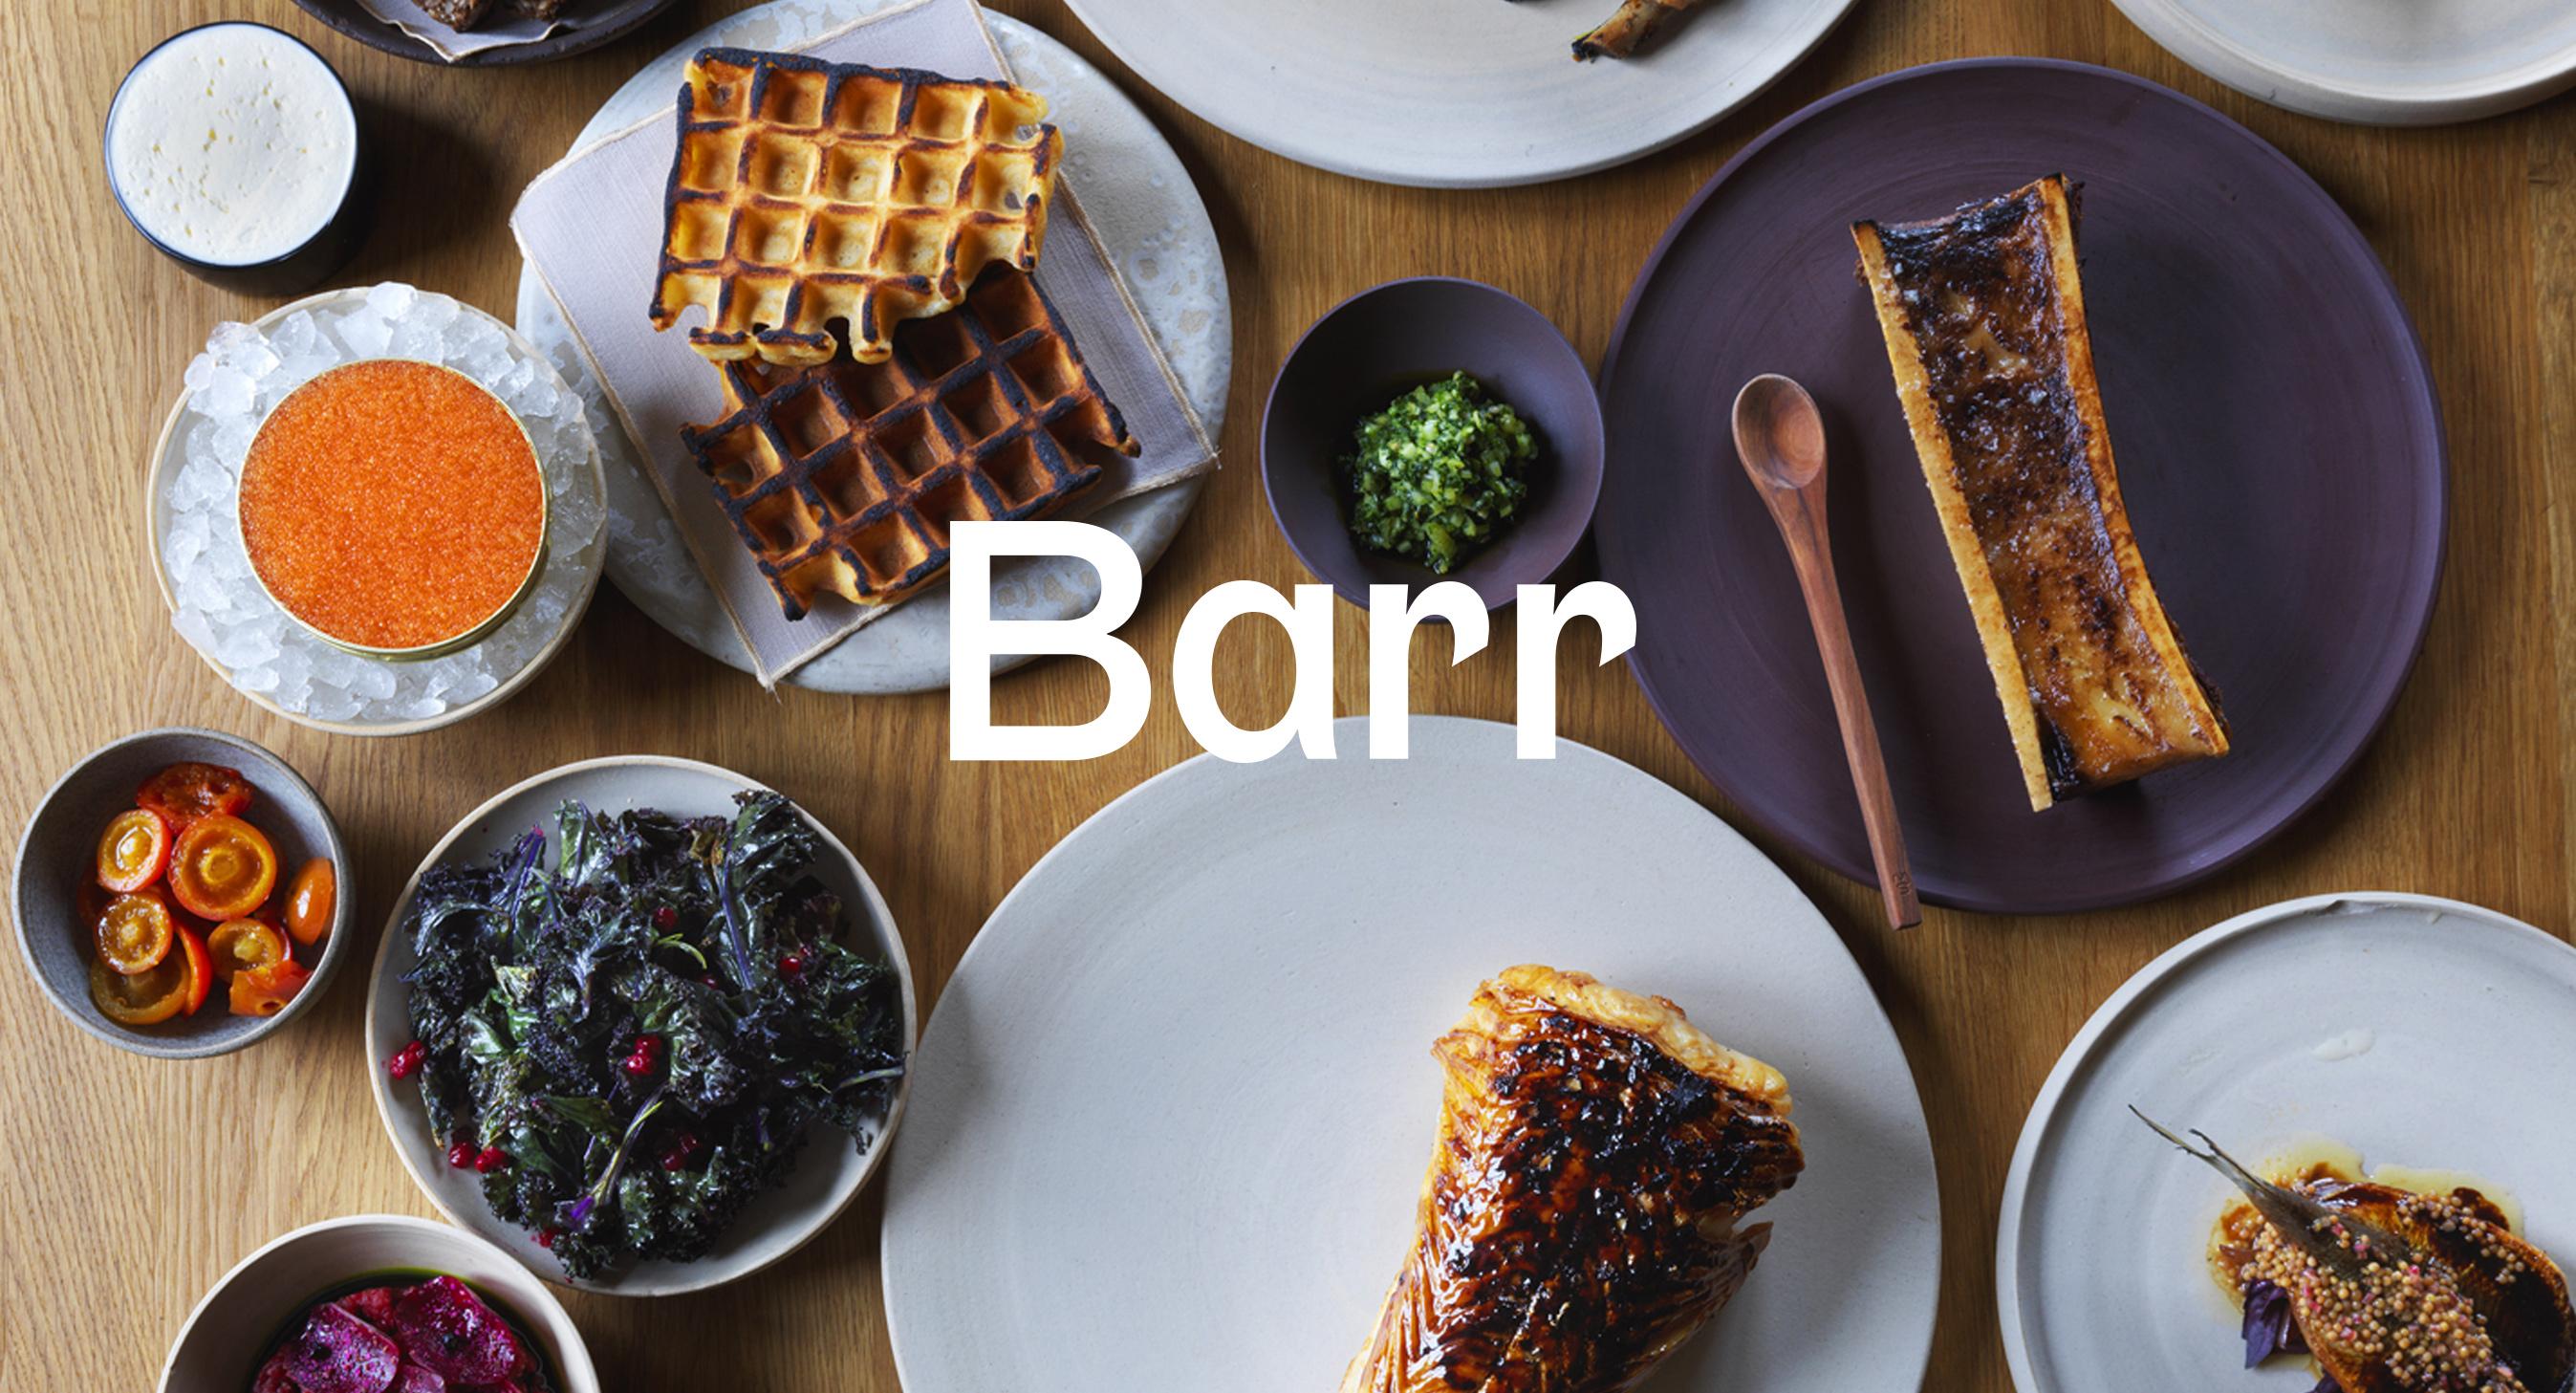 Restaurant Barr